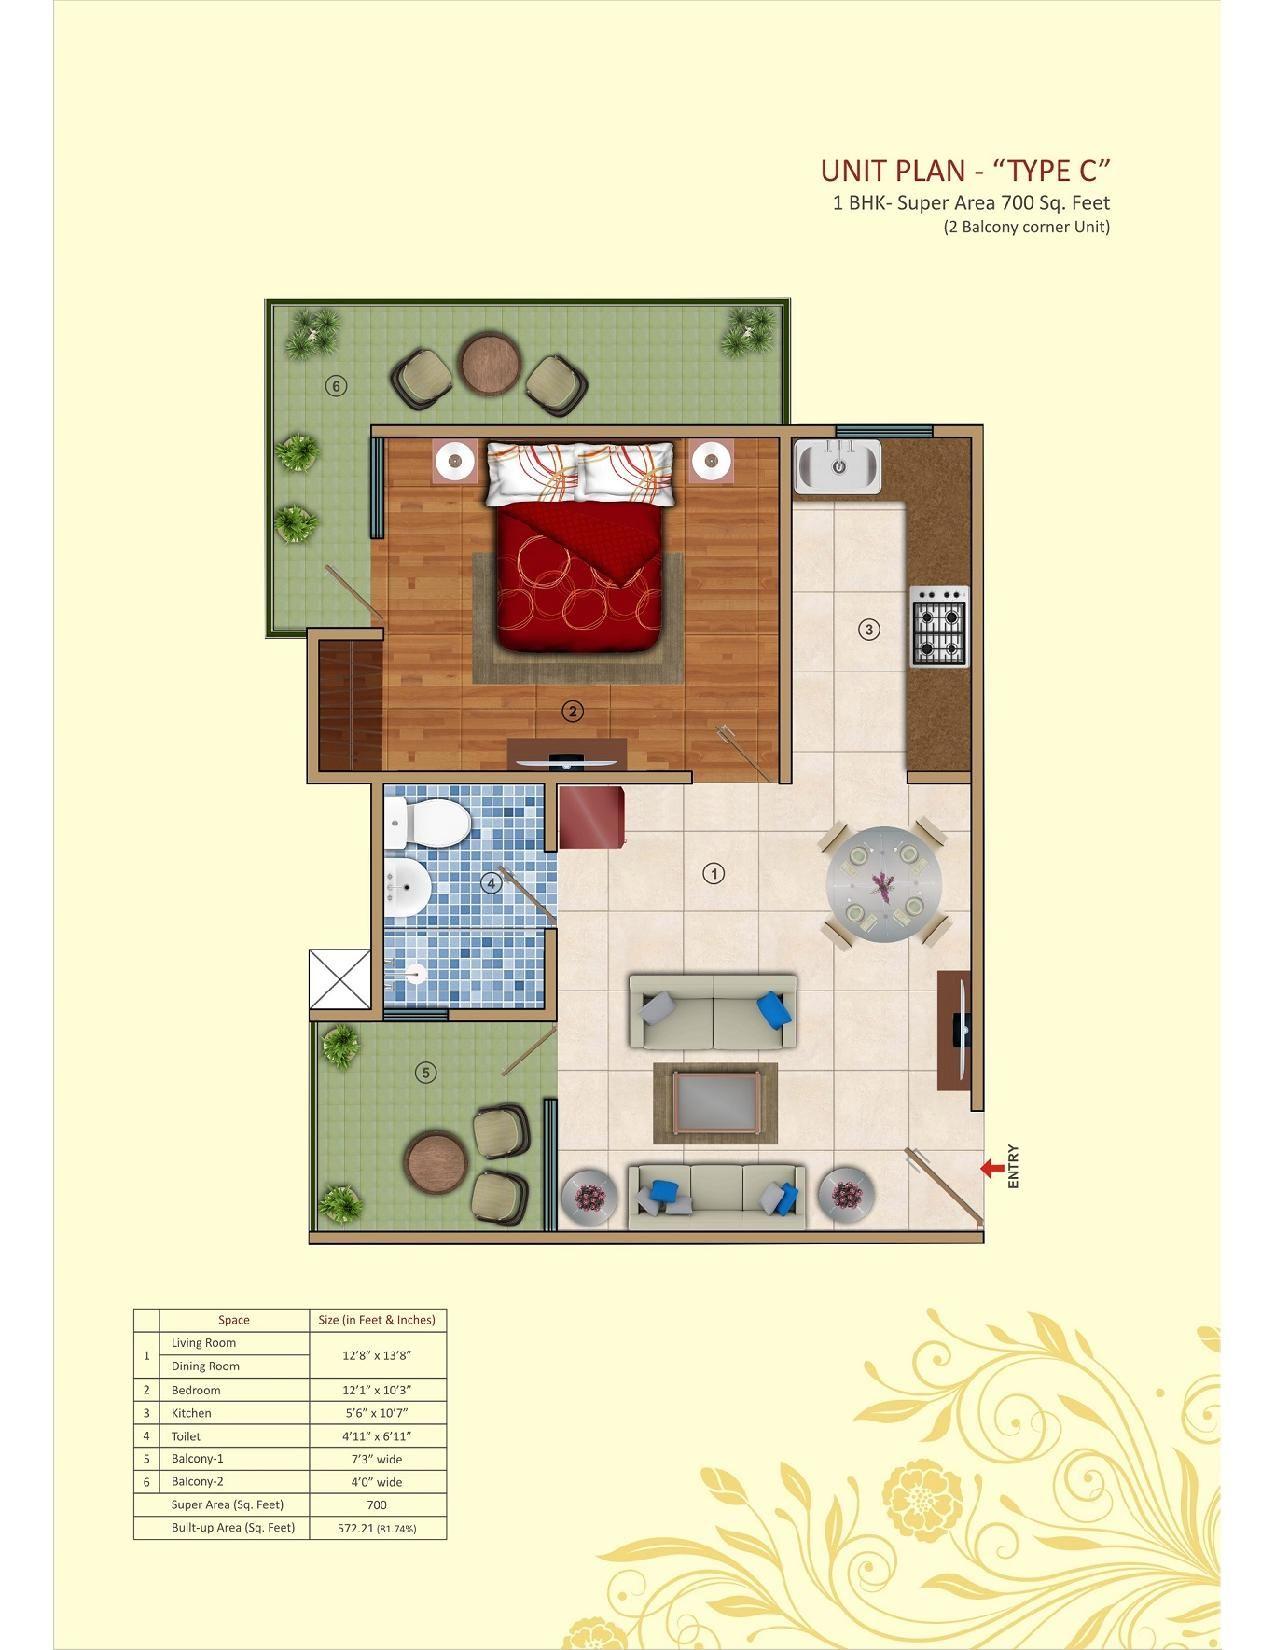 Tech Zone Residency 1 BHK Super Area 700 Sq. Ft. Floor